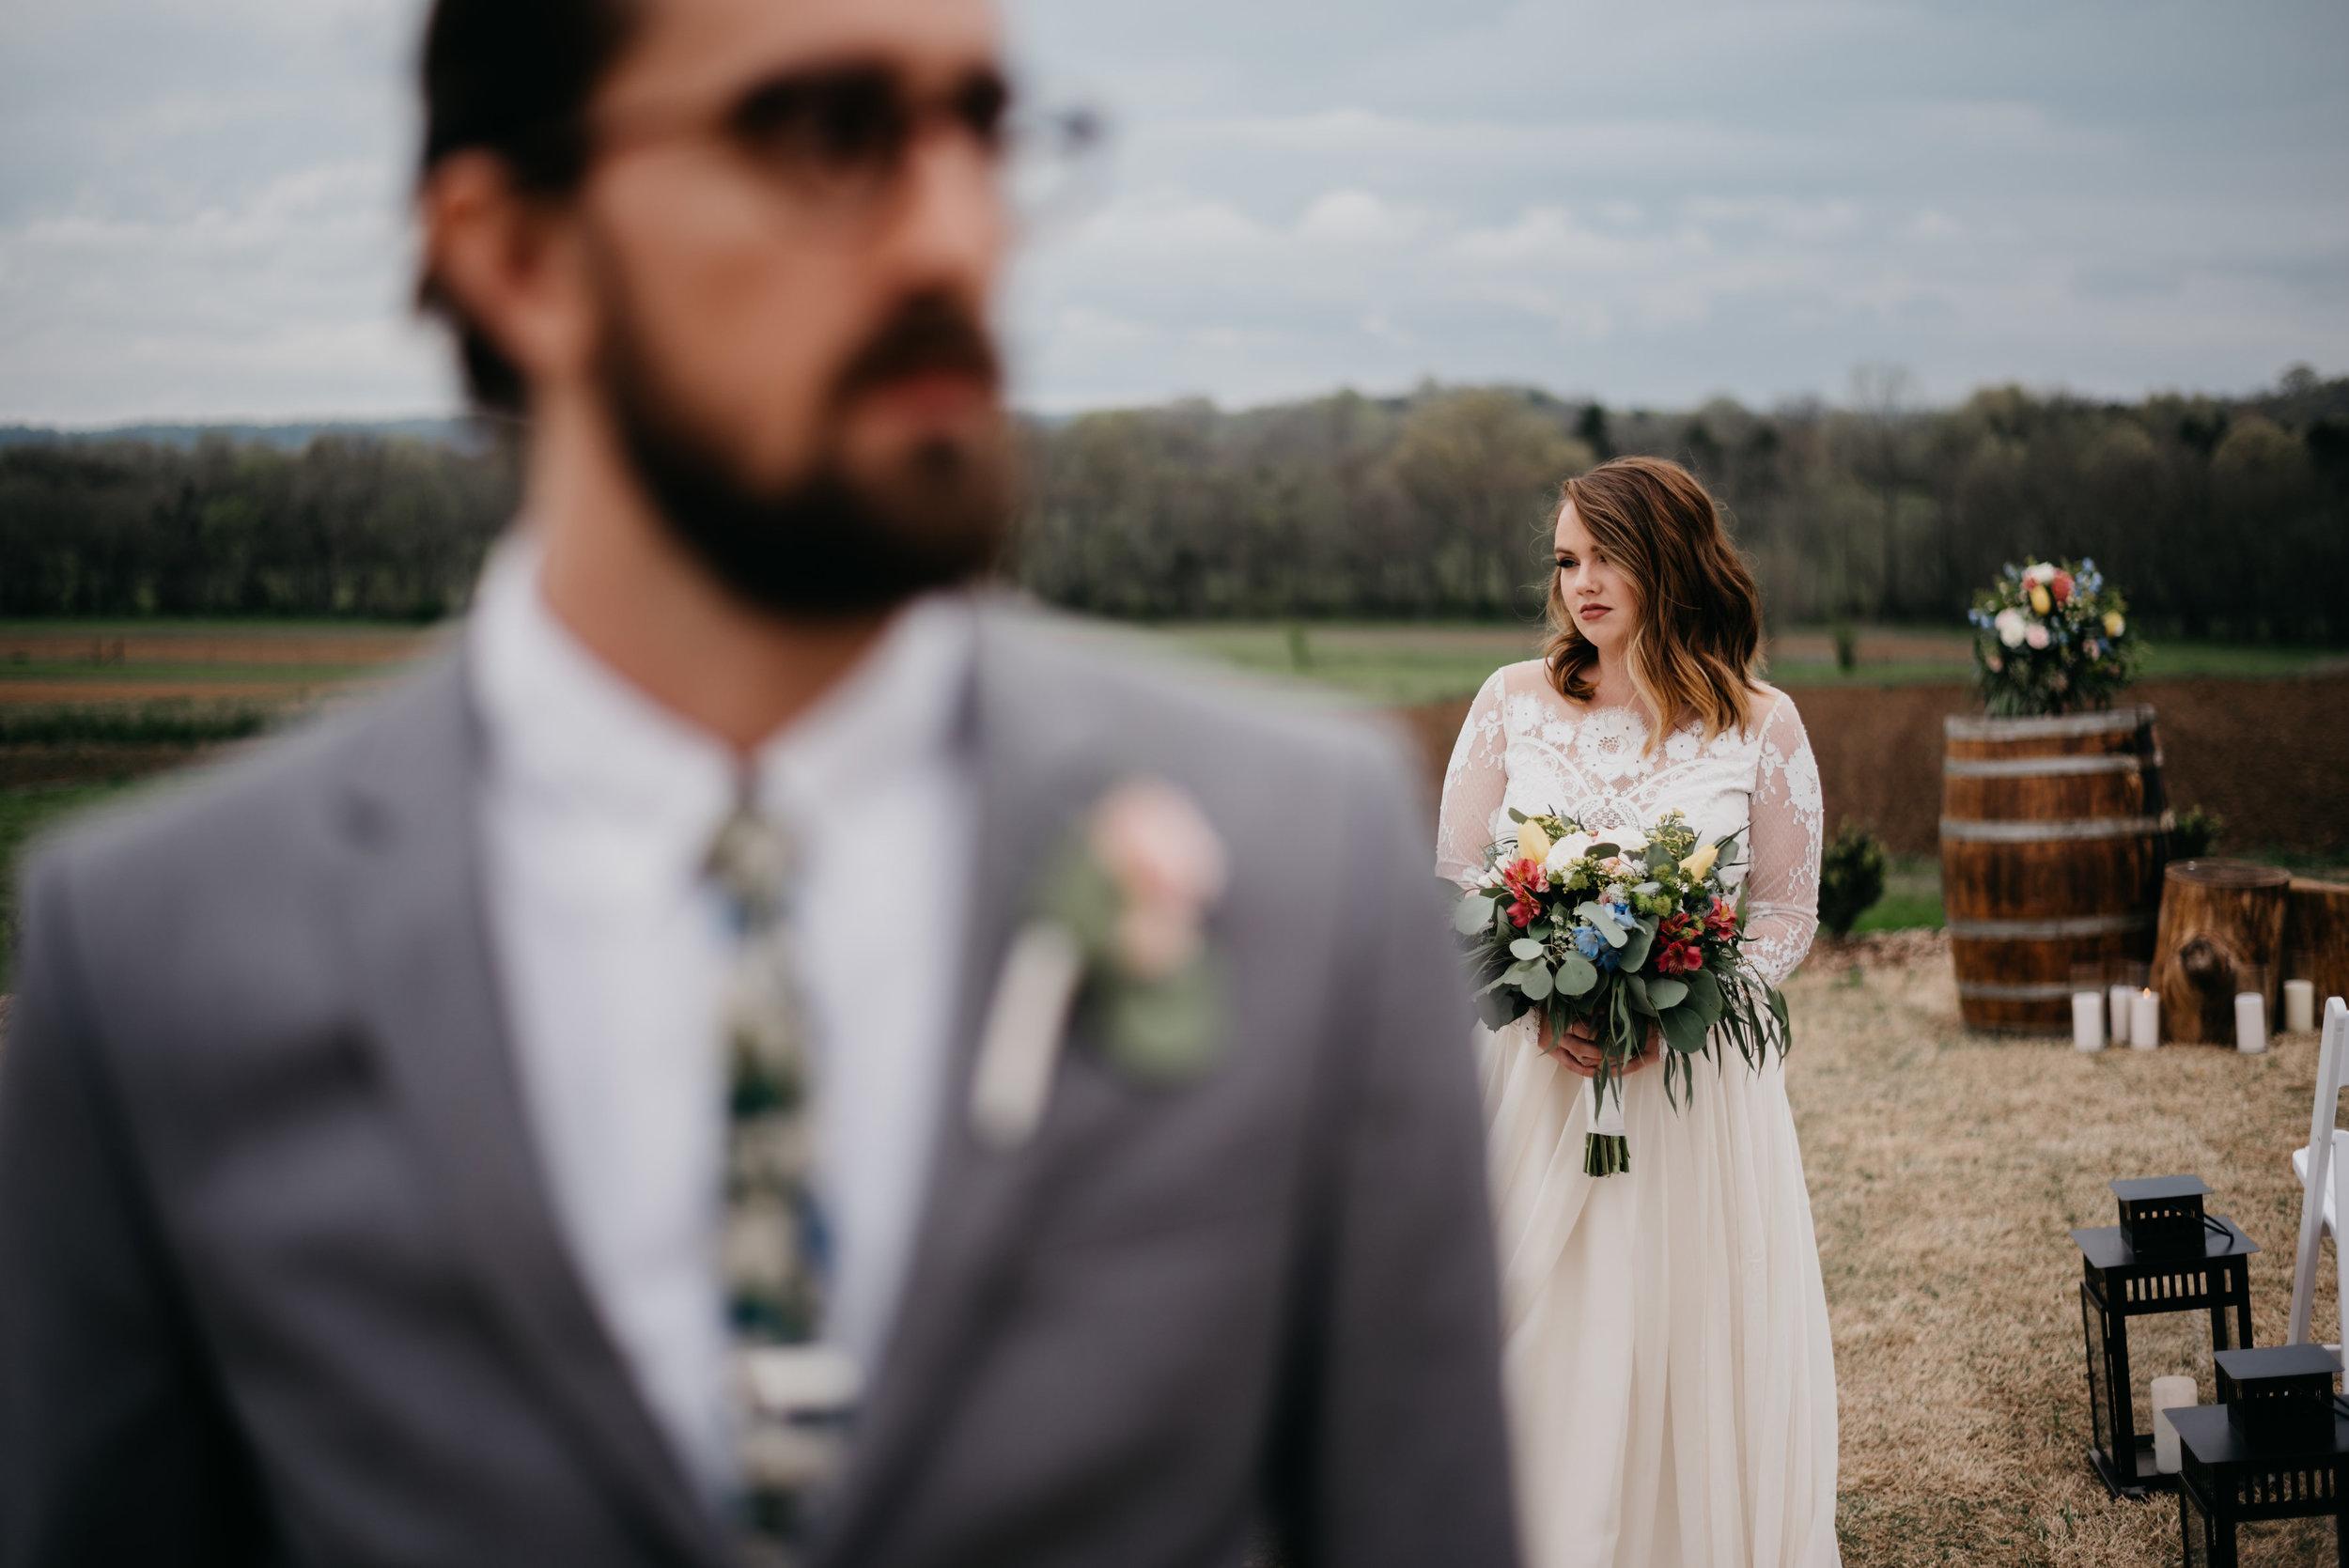 Allenbrooke-Farms-Nashville-Wedding-Photographers 10.jpg